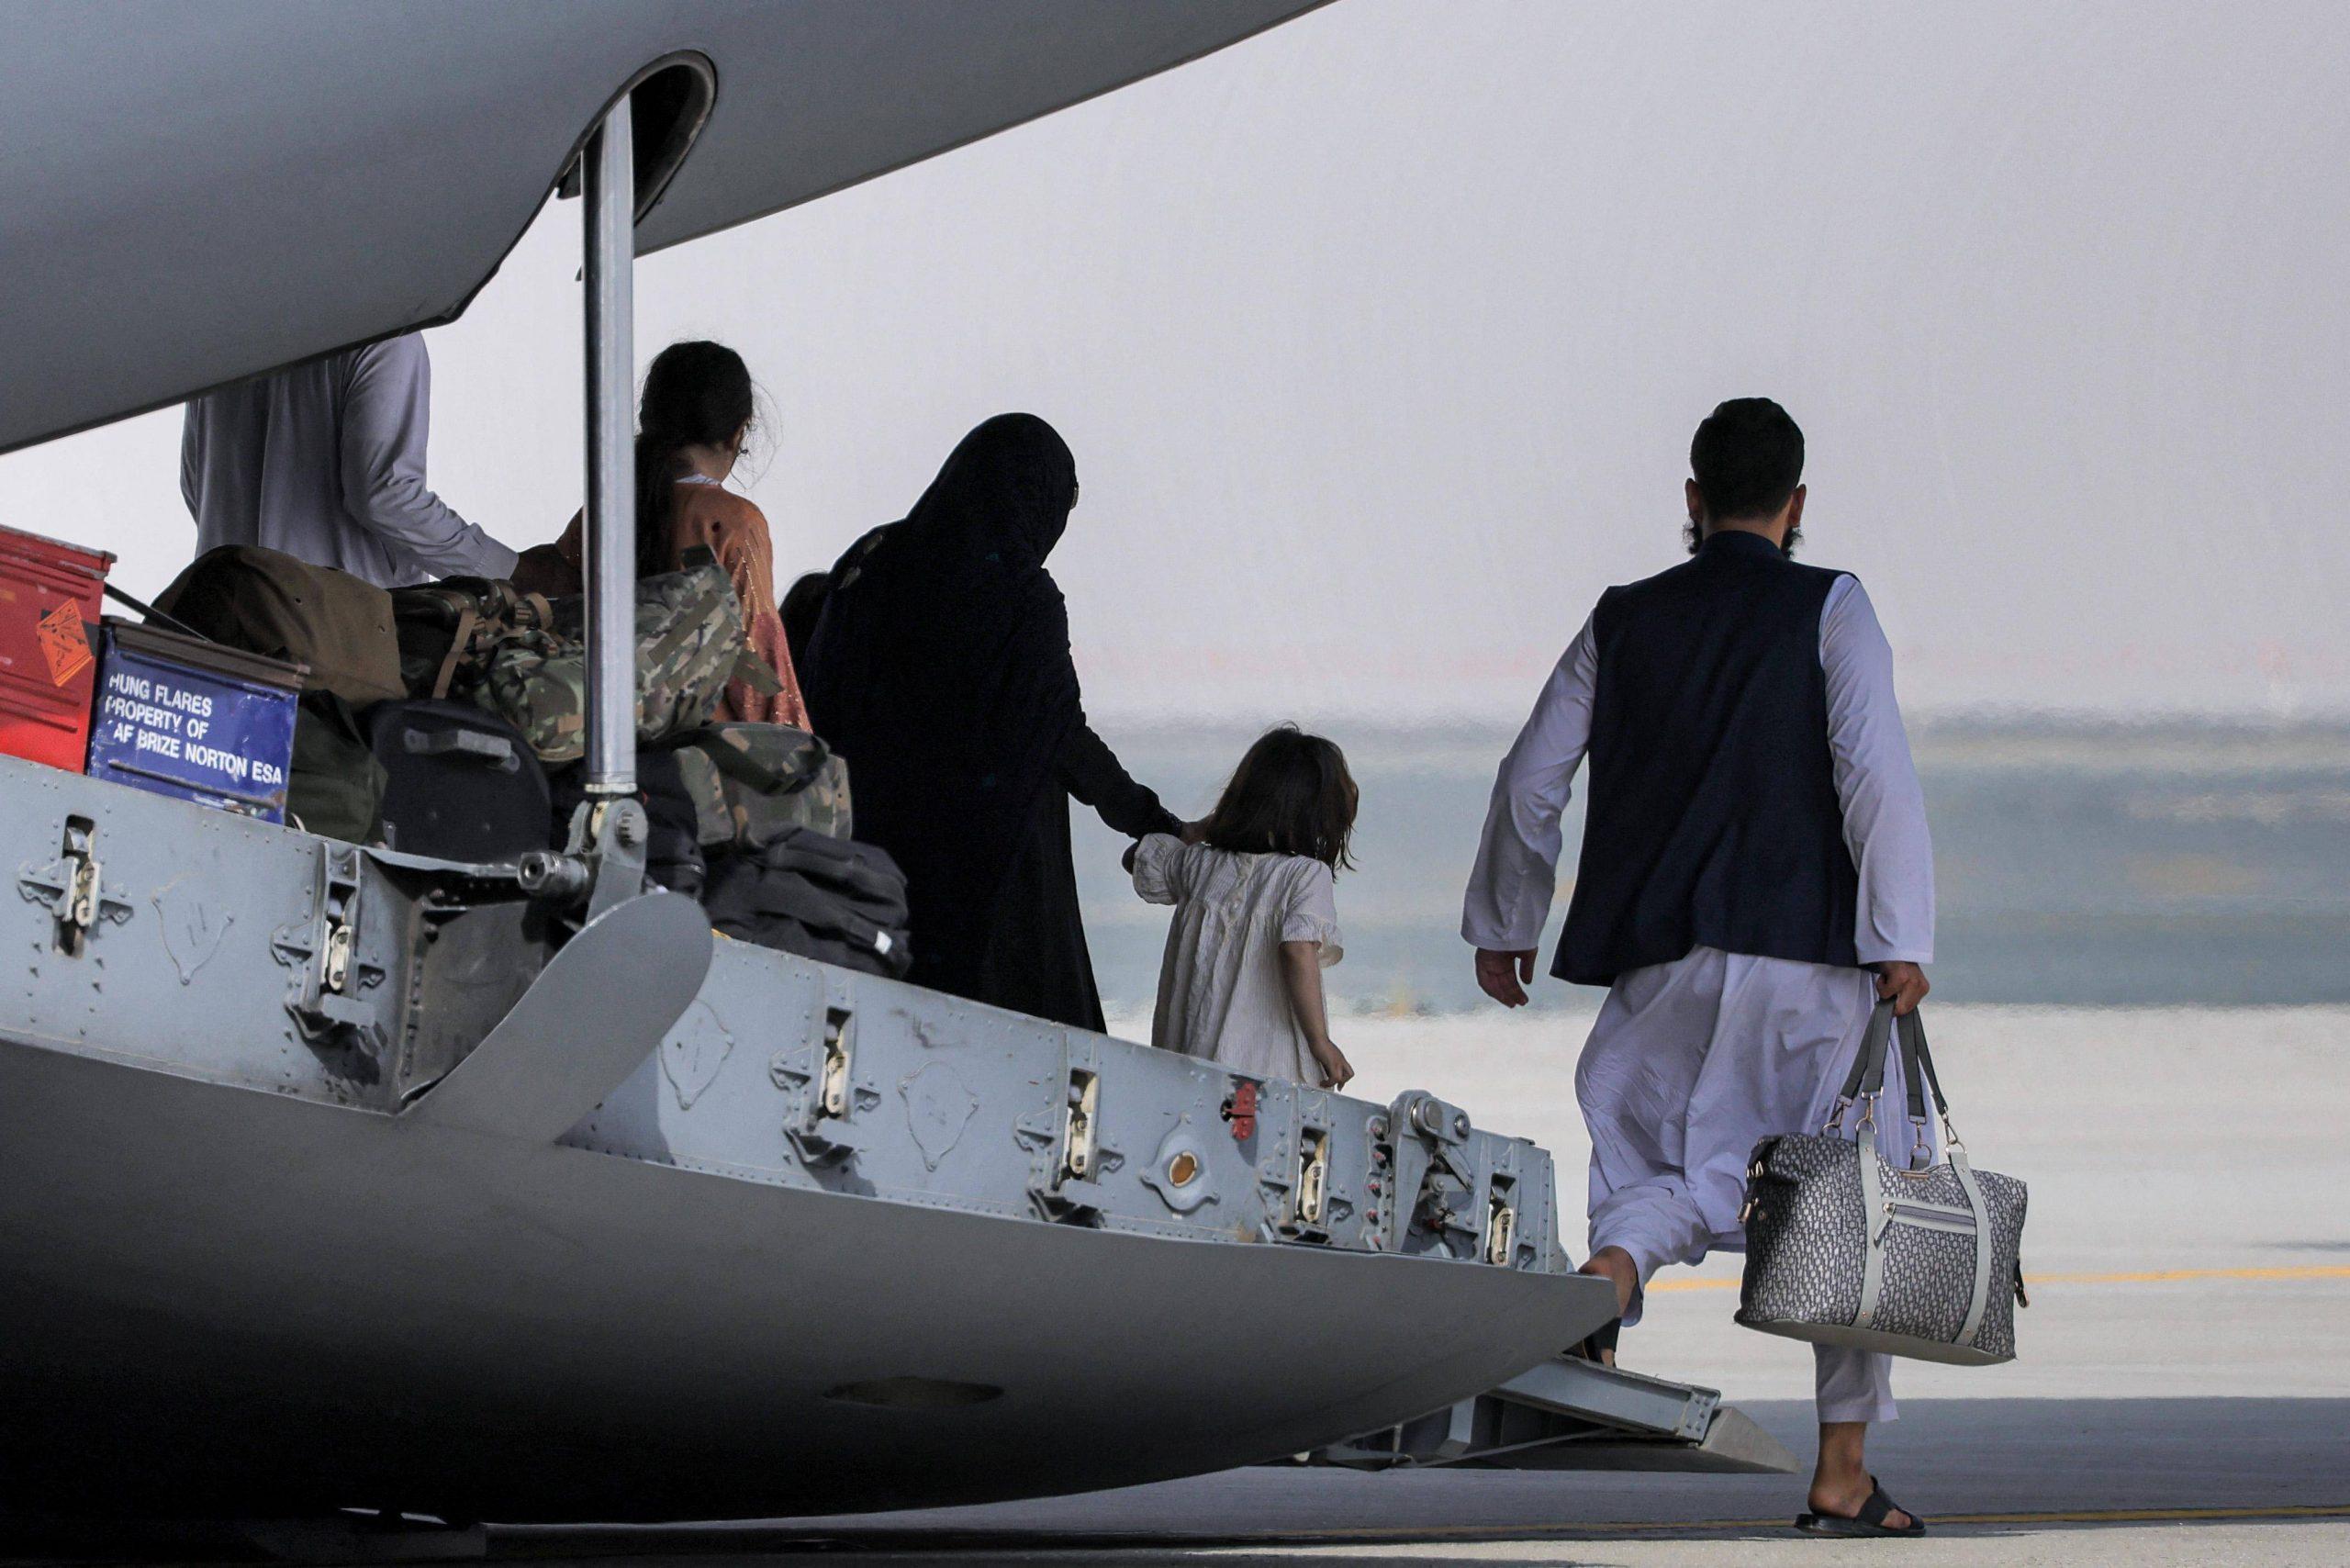 AFGHANISTAN, NEGLI EMIRATI ACCOLTI MIGLIAIA DI RIFUGIATI